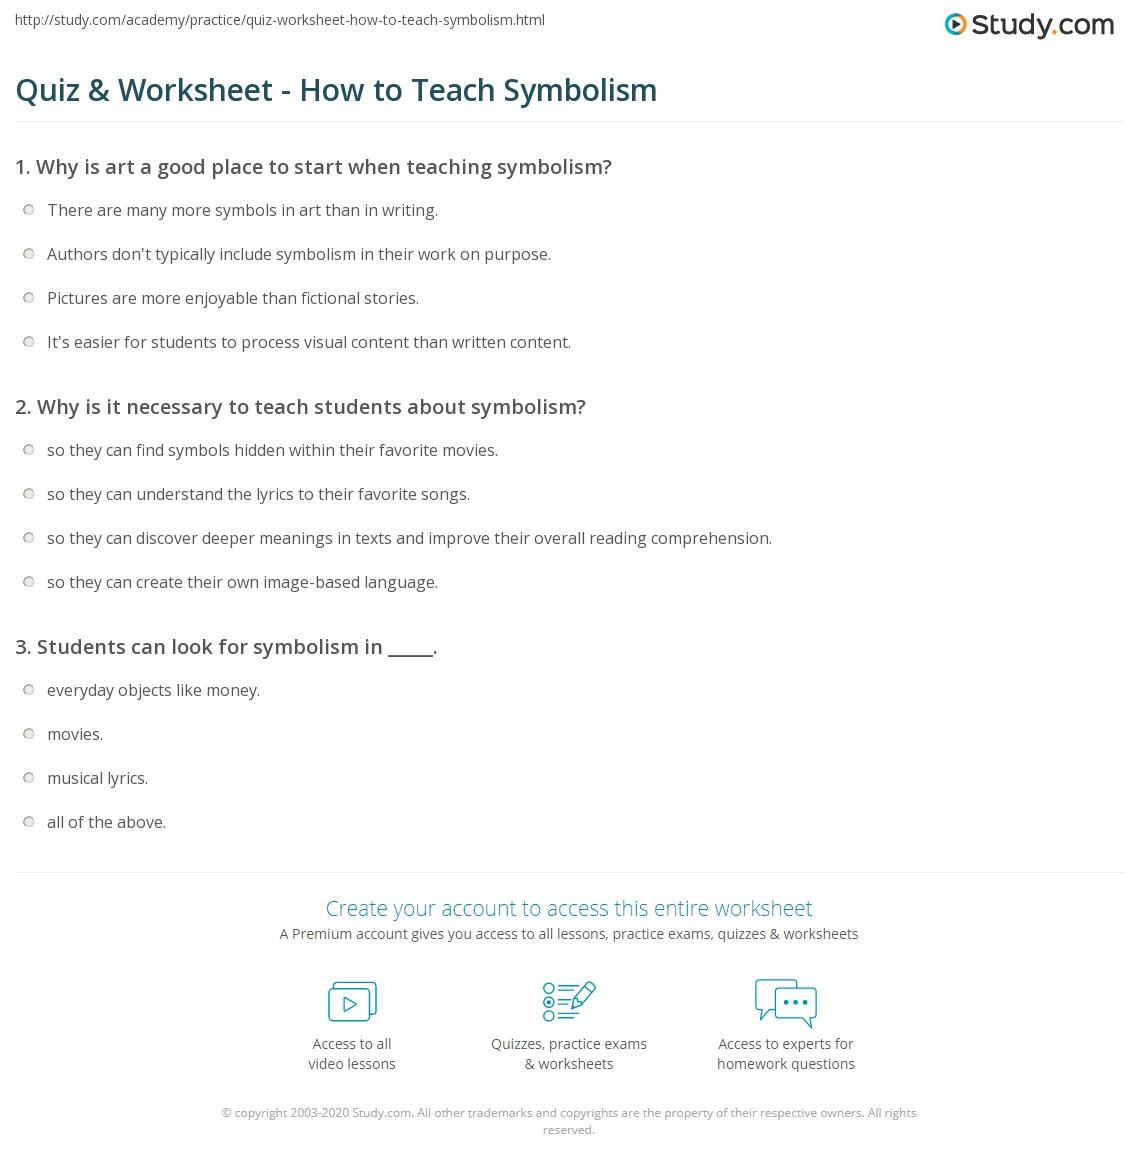 Quiz Worksheet How To Teach Symbolism Study